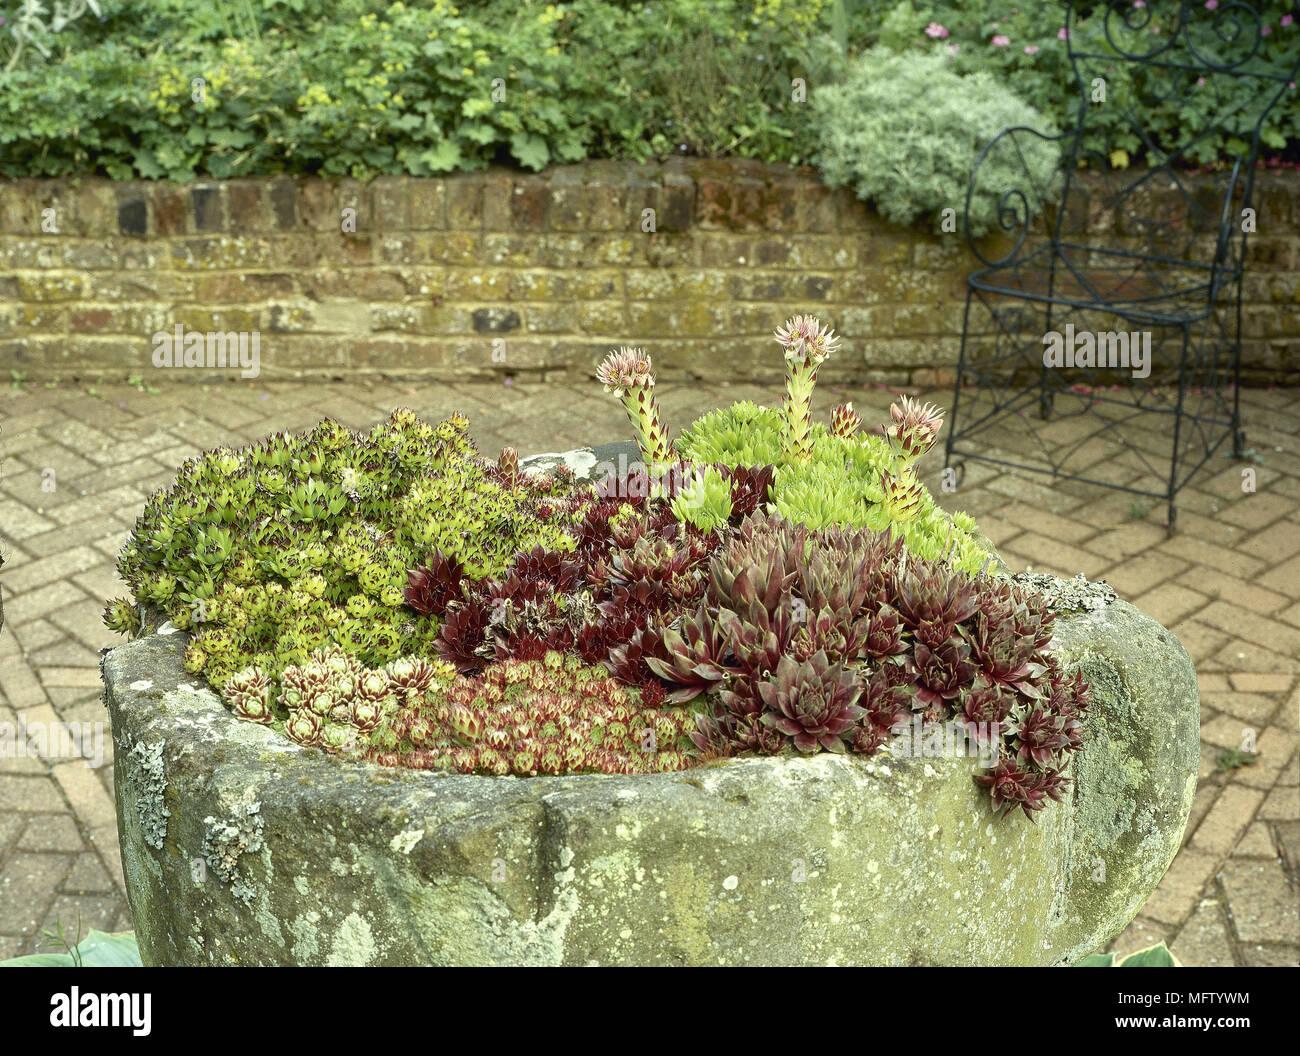 Garden Feature Ancient Touf Filled With Plants Brick Patio Area Gardens  Detail Stone Planter Trough Sedums Block Paving